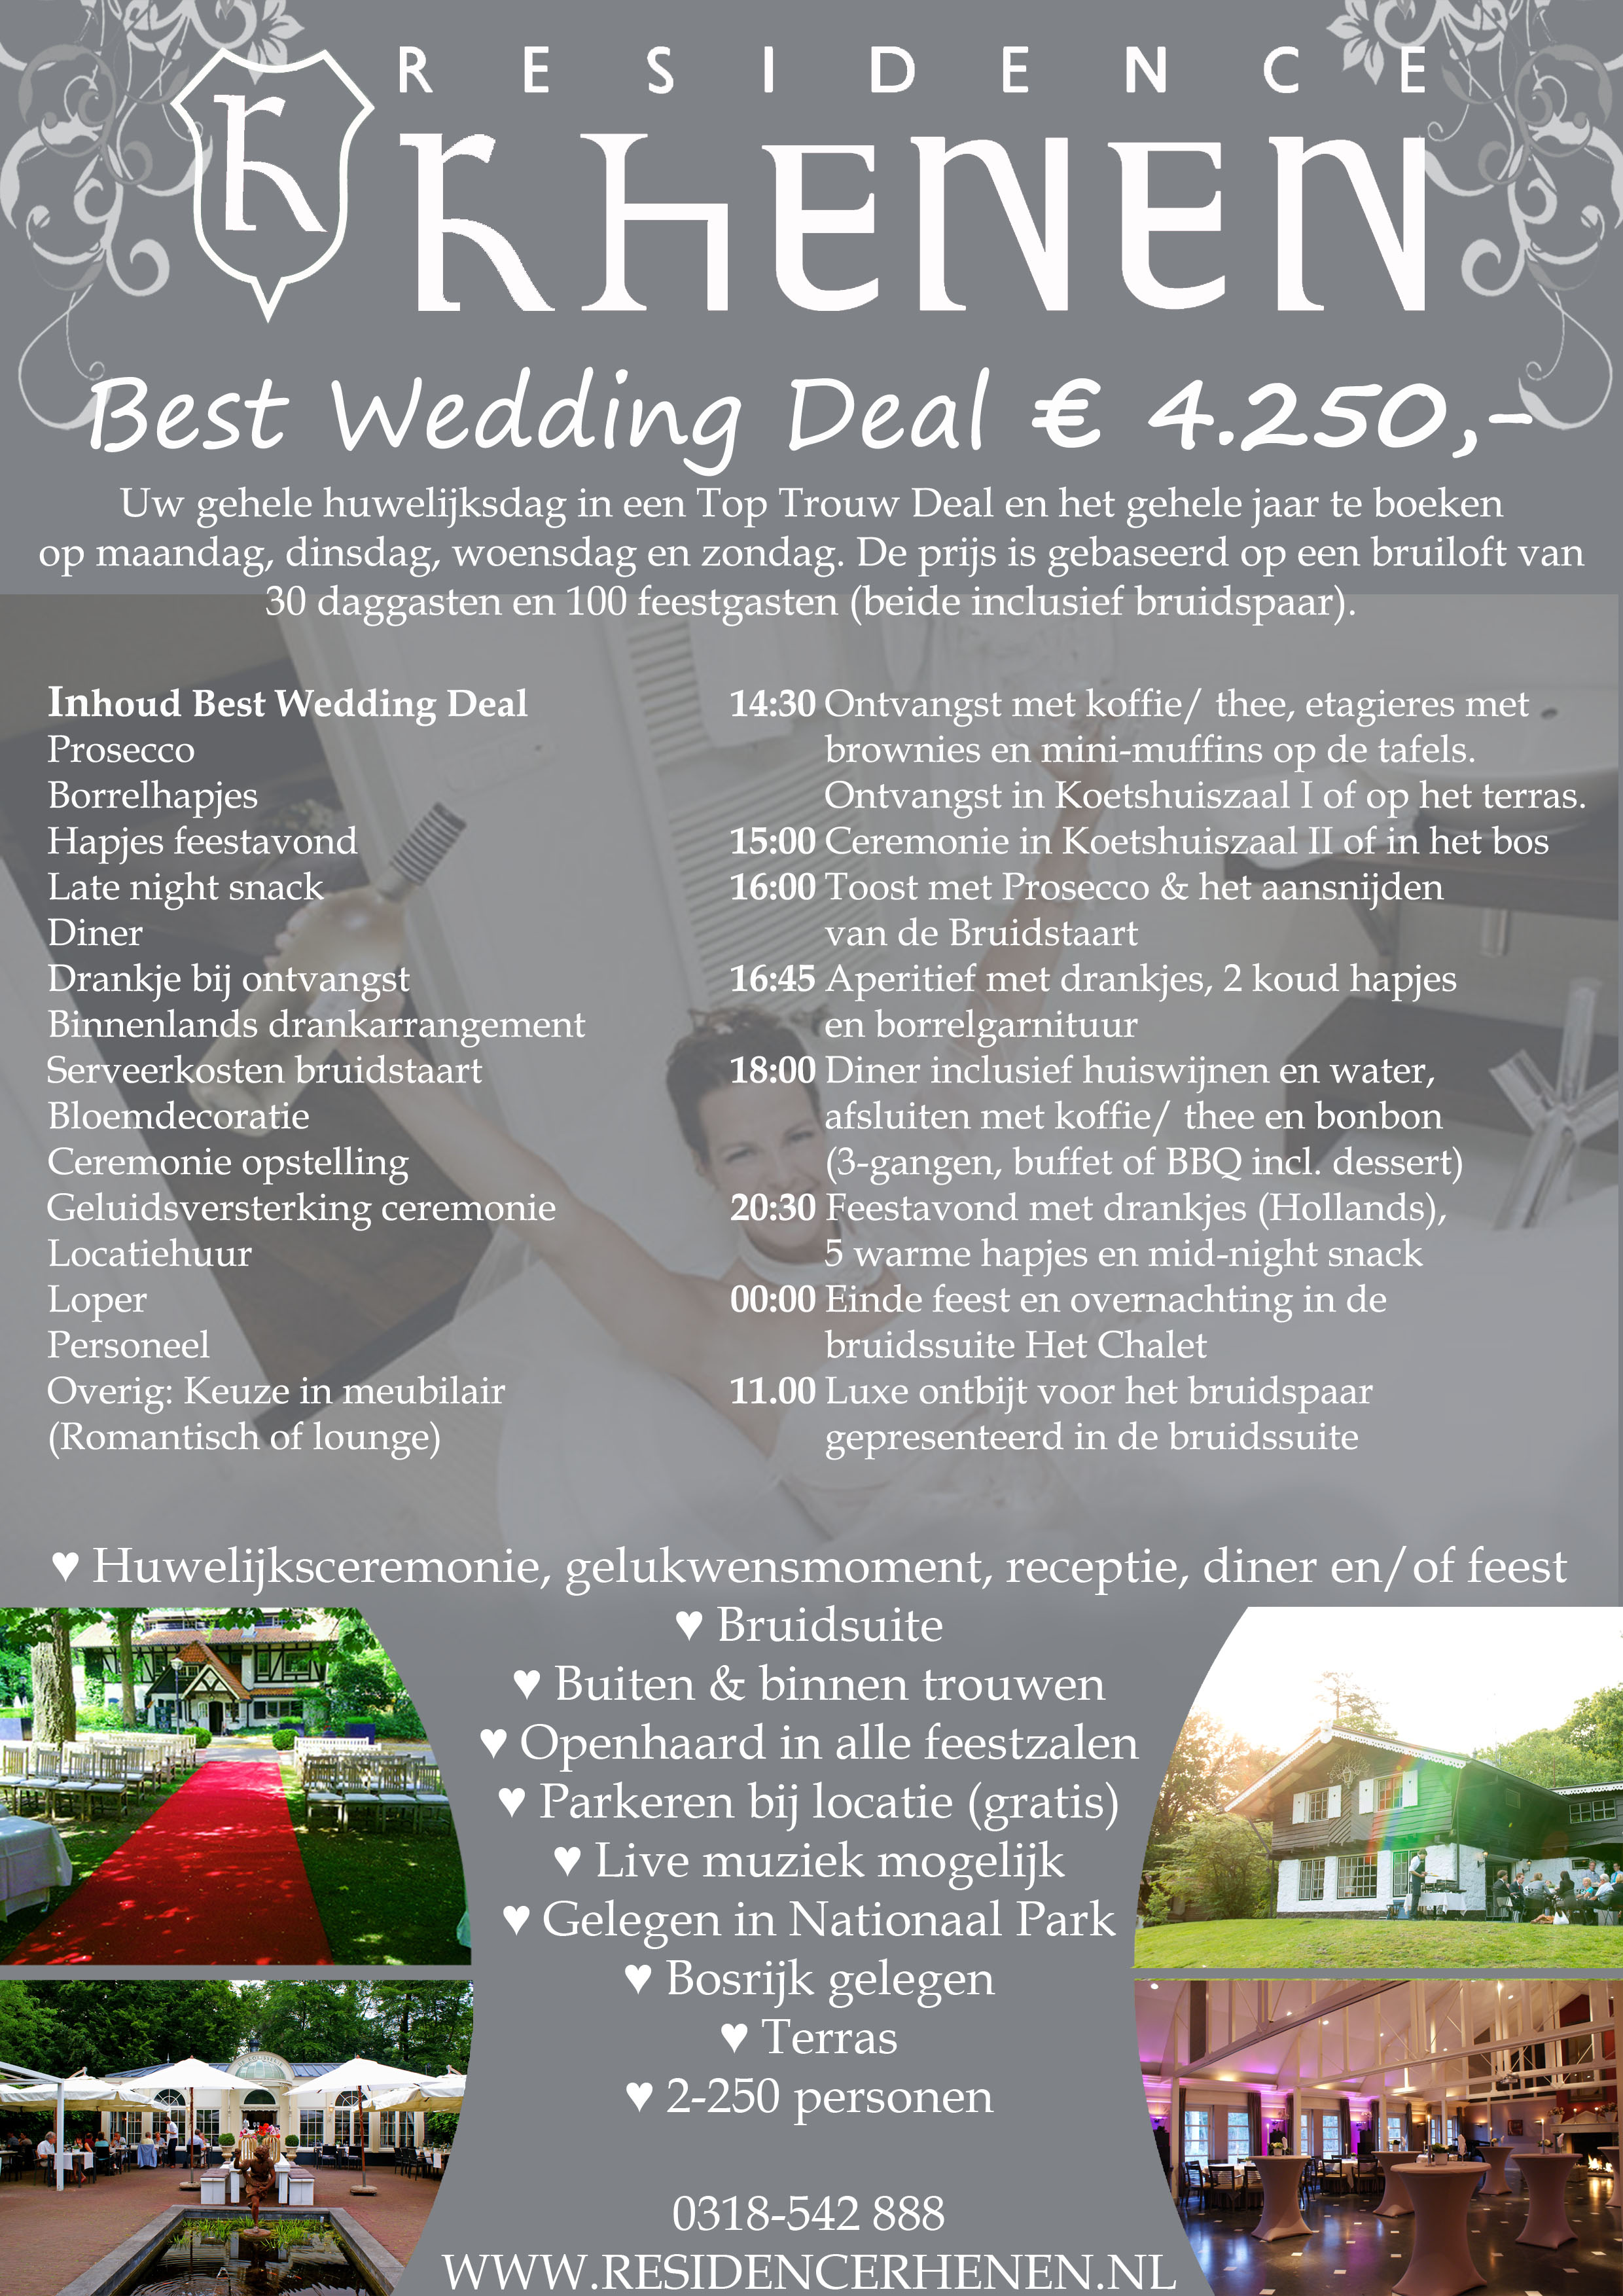 Best Wedding Deal